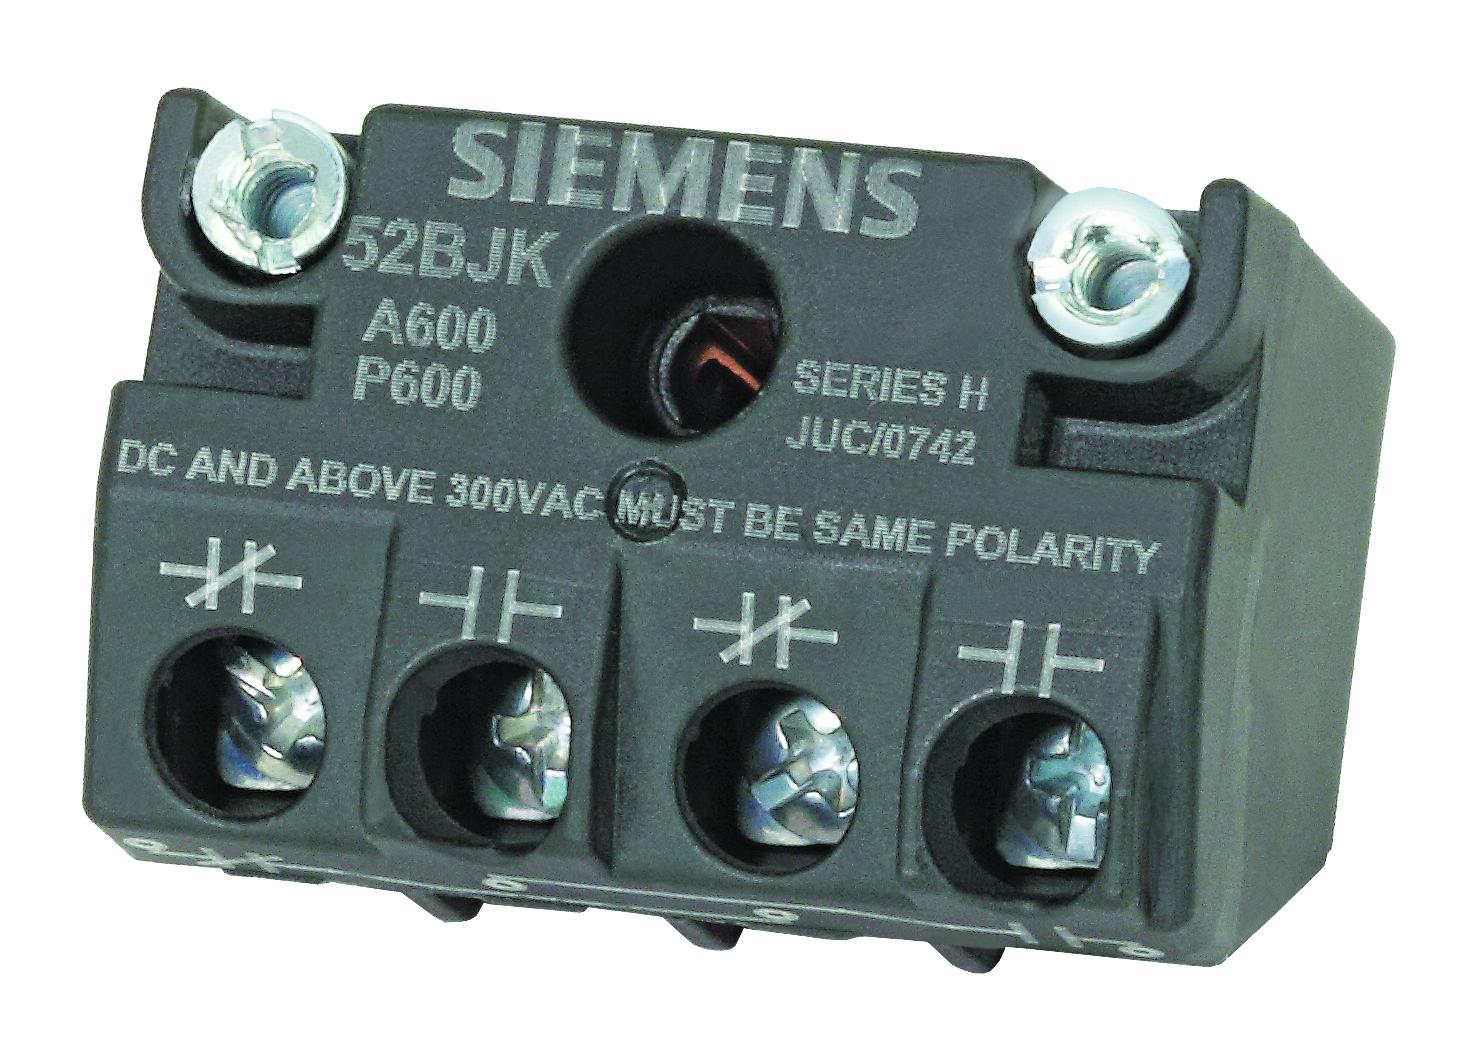 Siemens52BJK